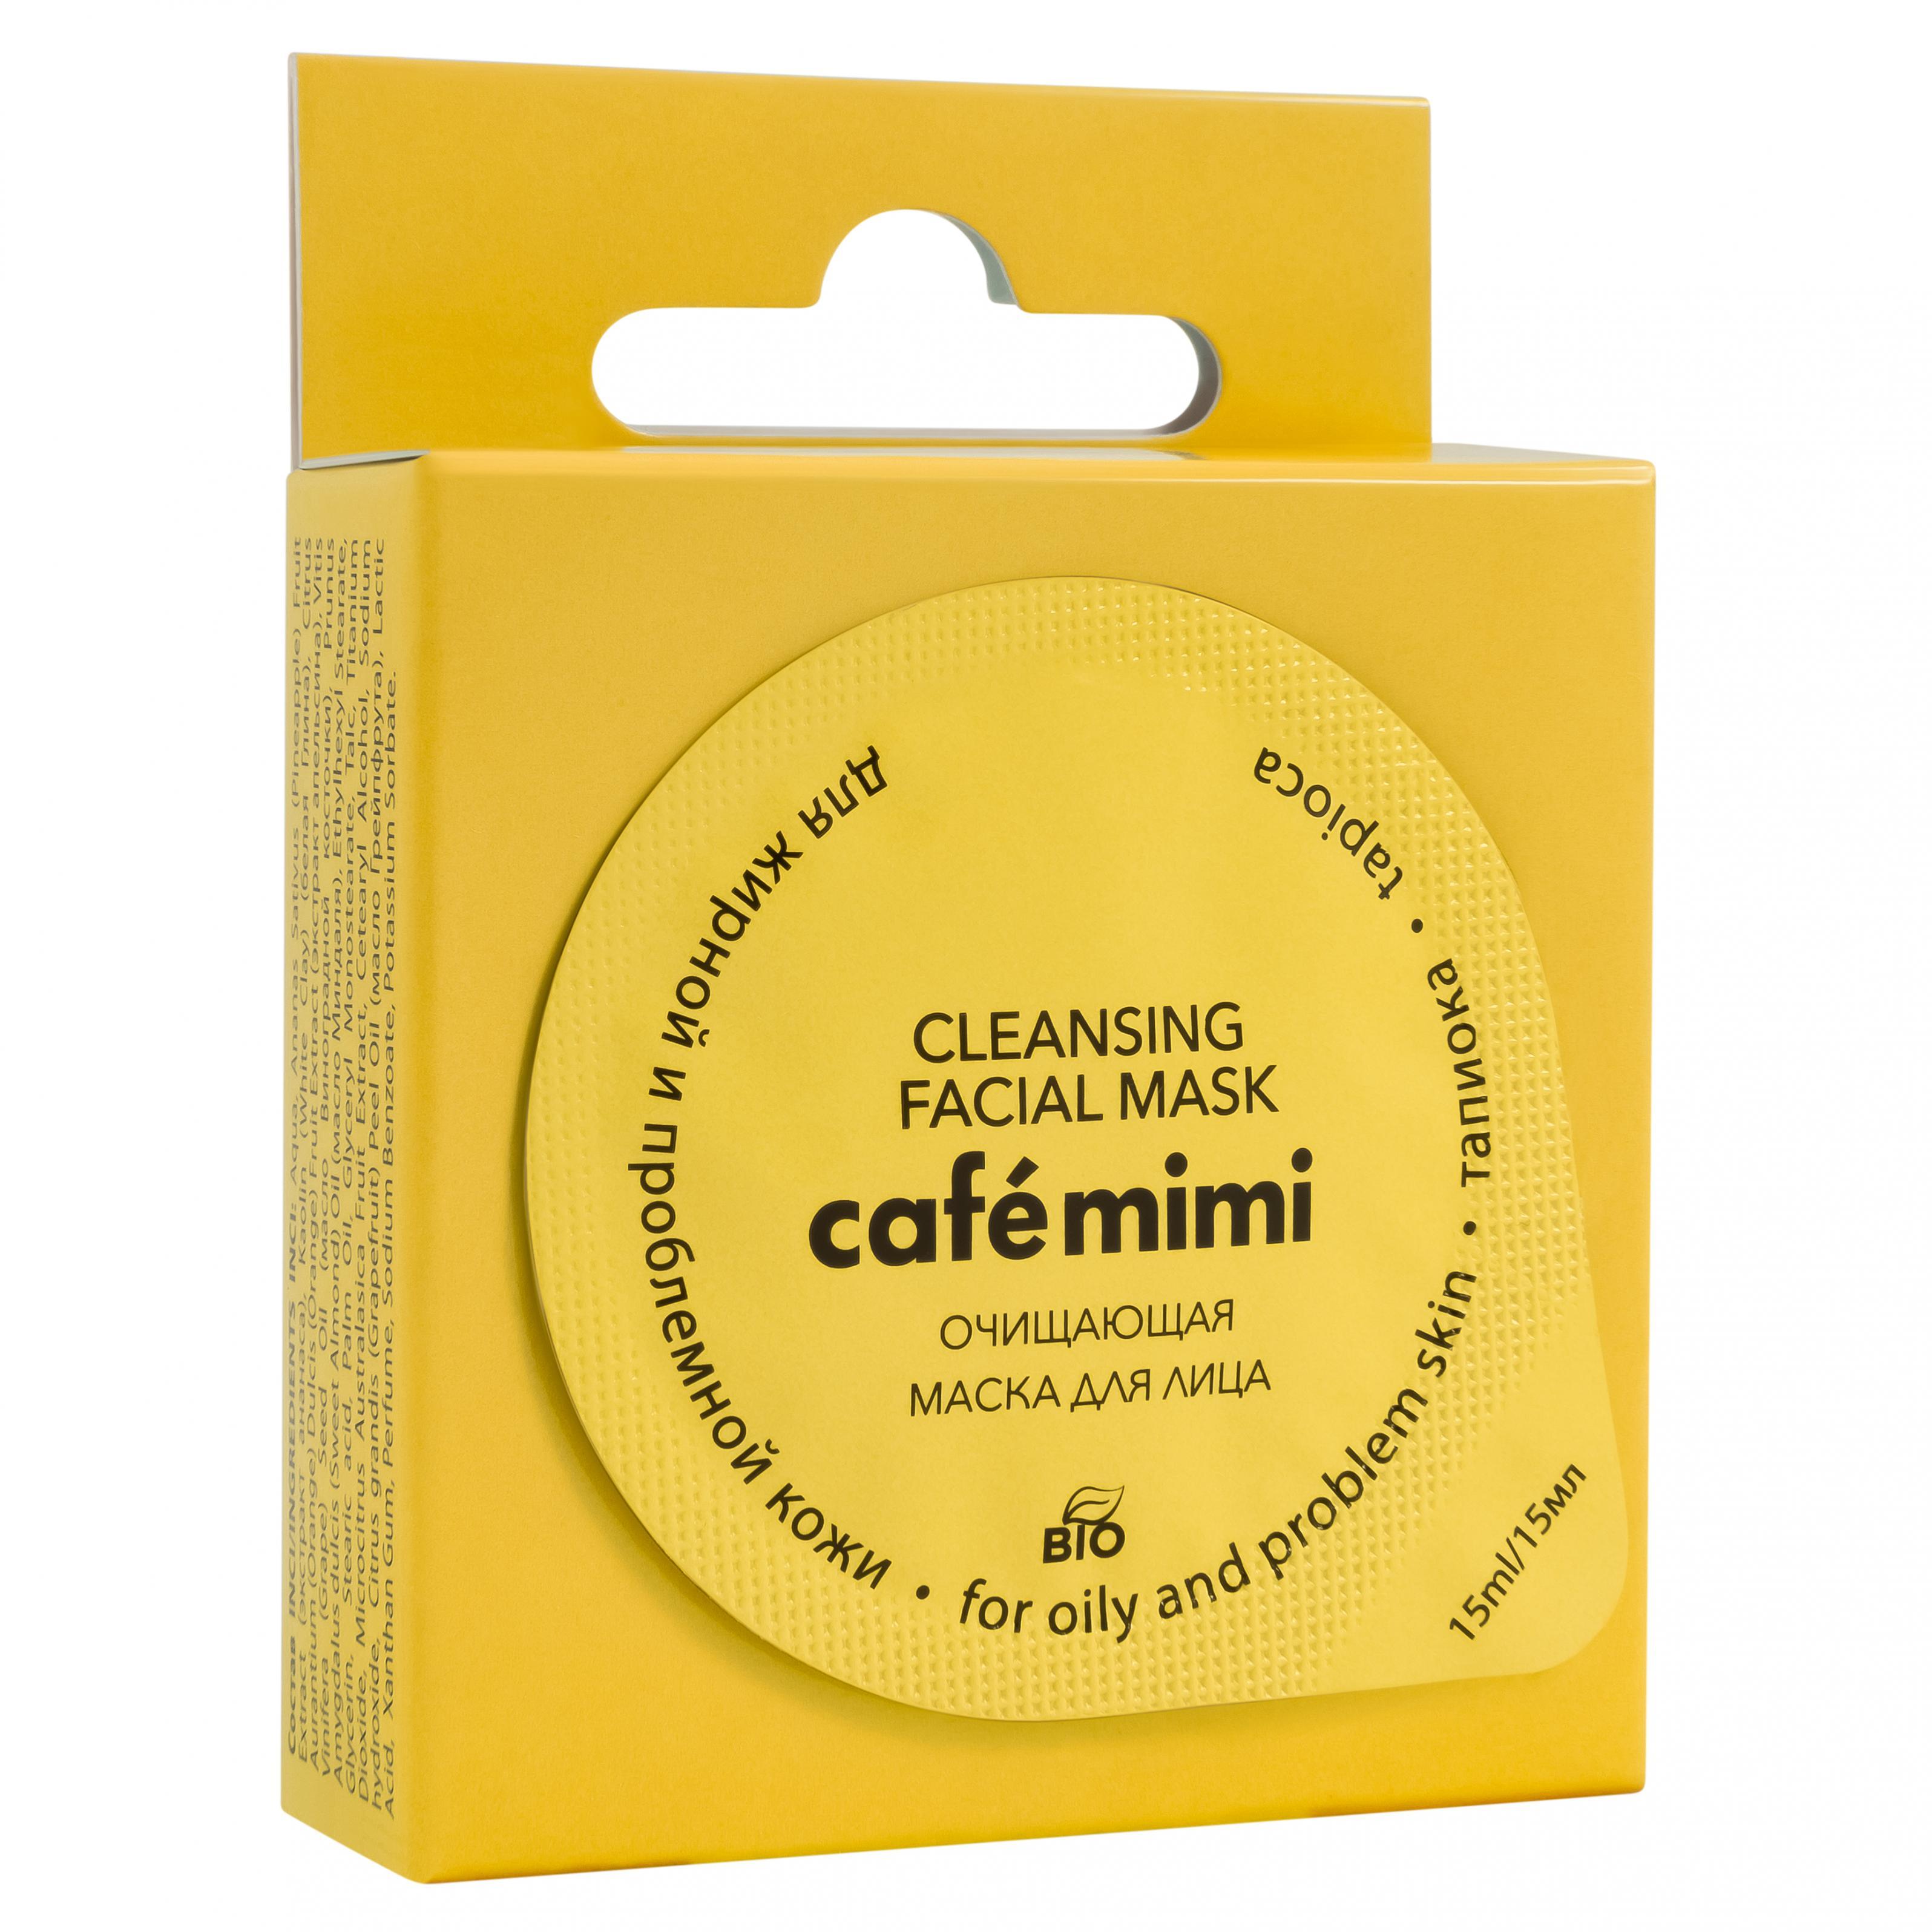 Café Mimi Mascarilla Facial Exprés Limpiadora  15 ml